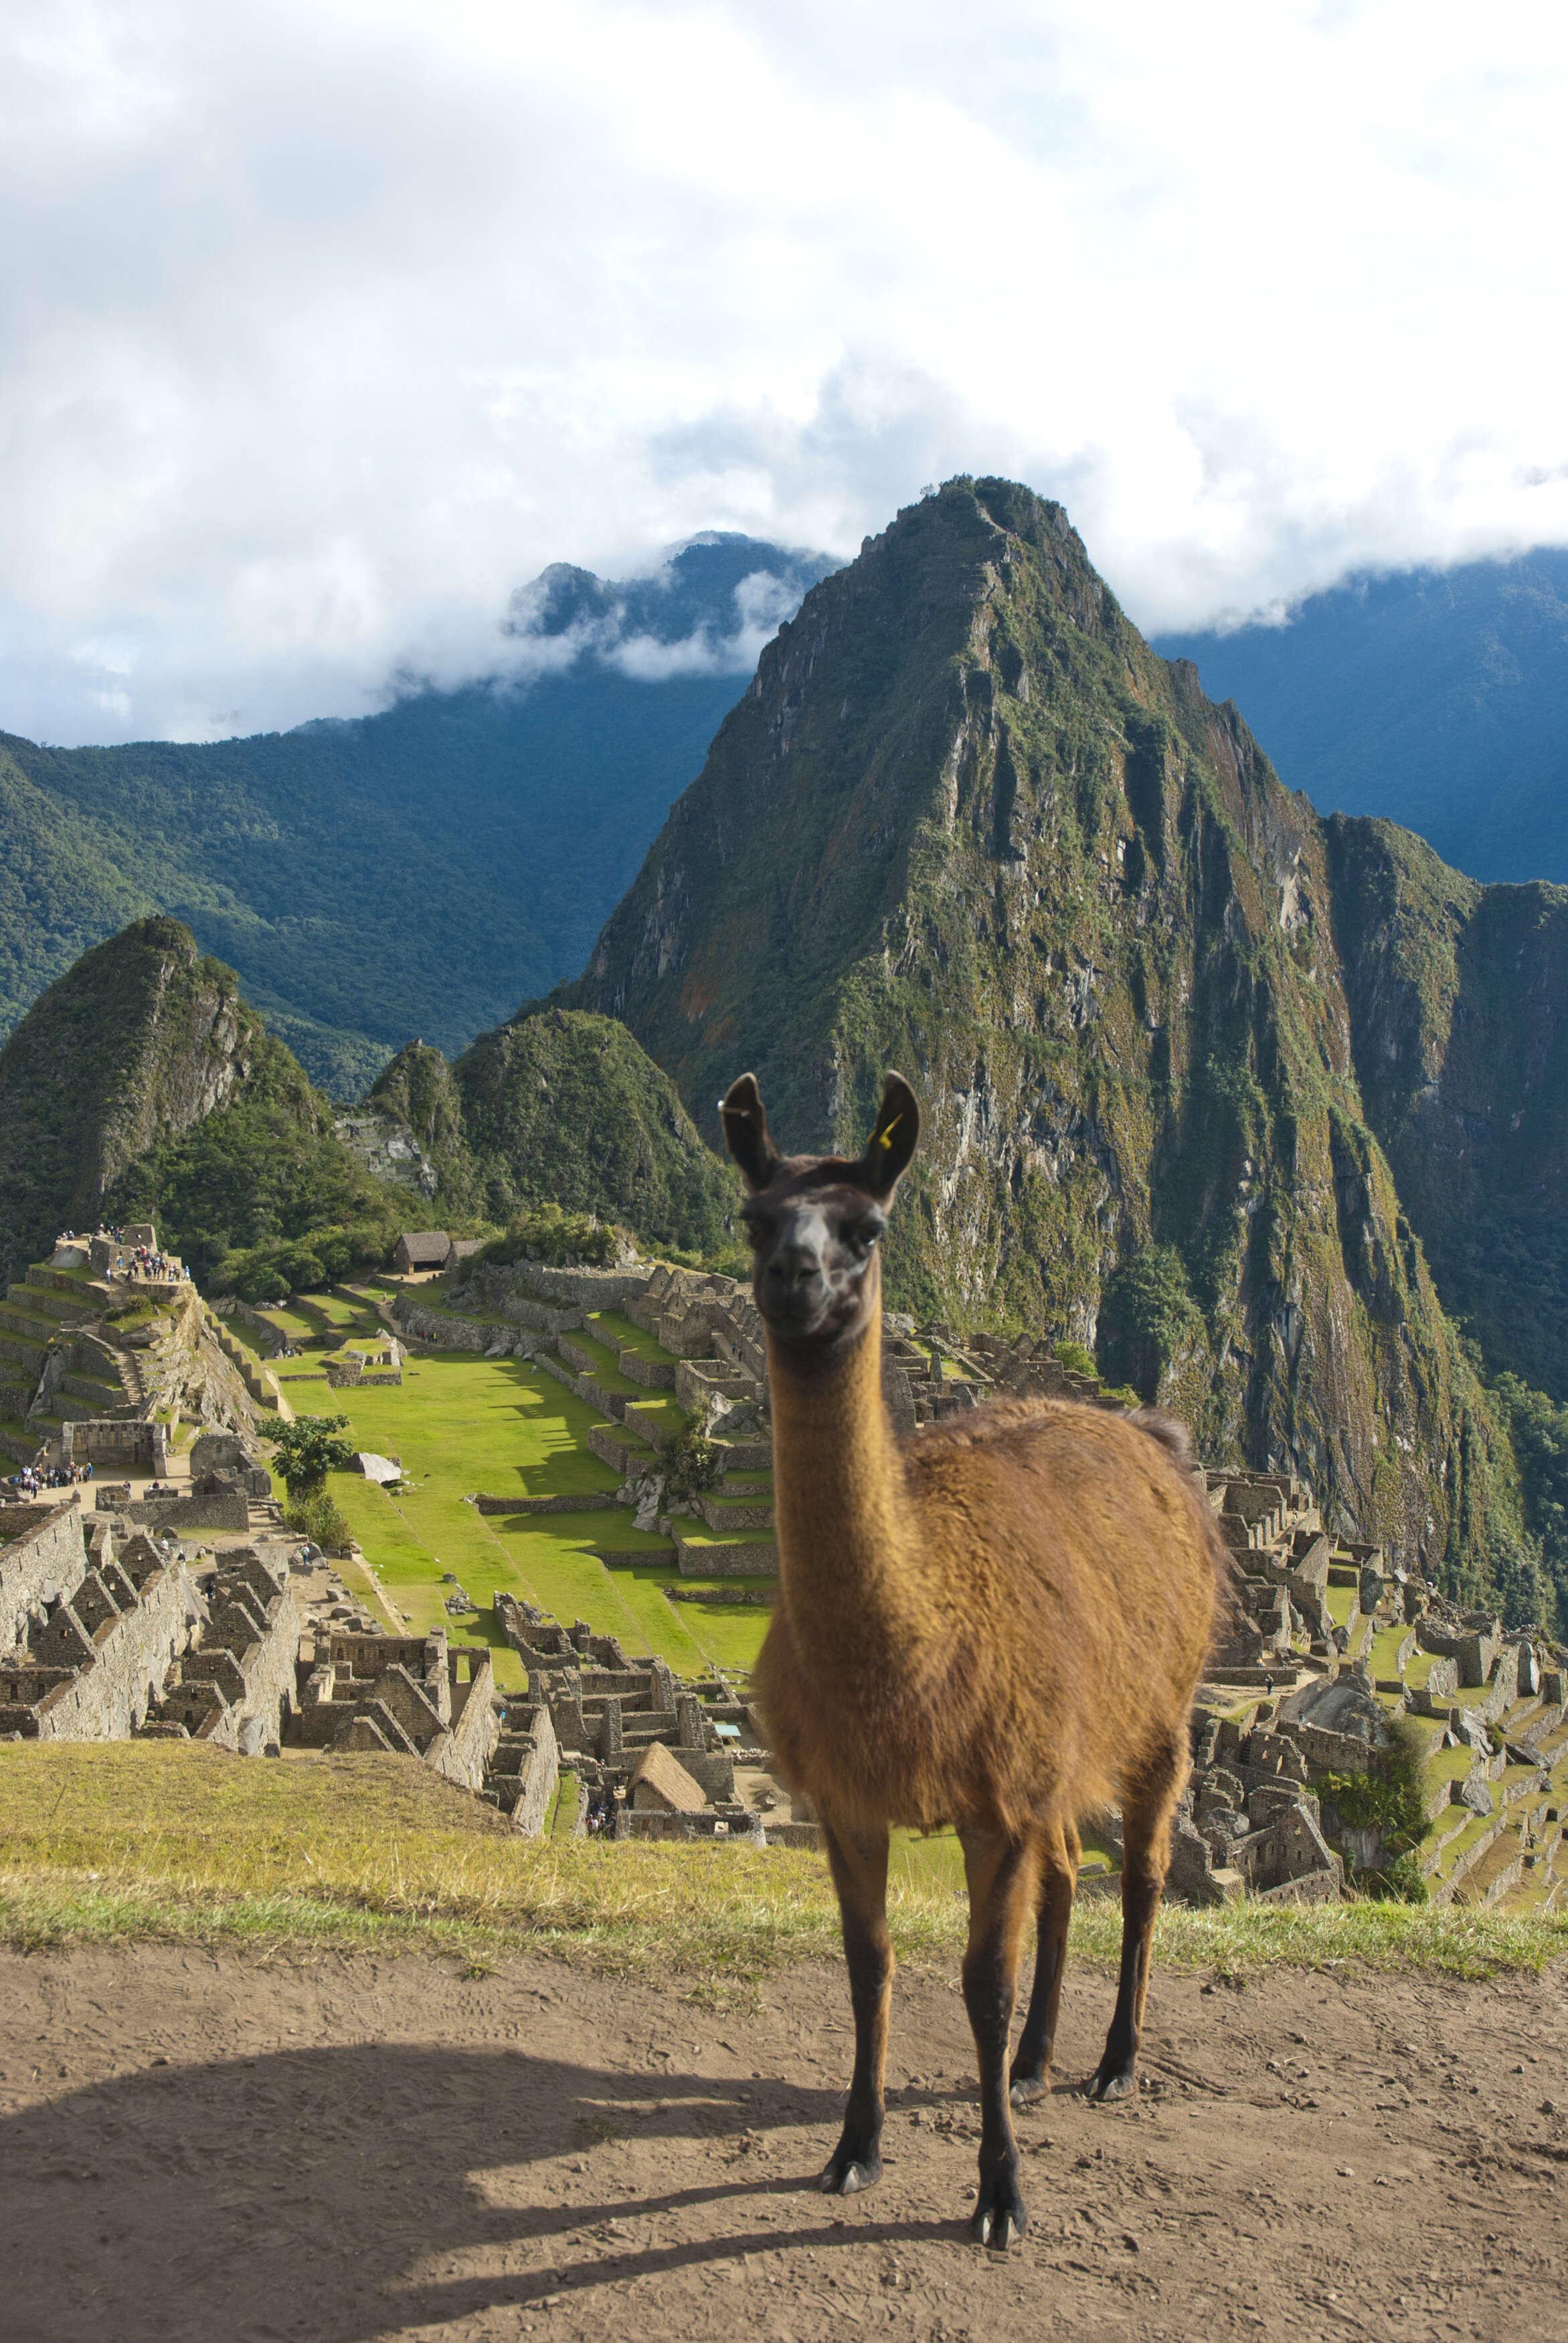 Beyond Machu Picchu: Three More Reasons to Travel to Peru